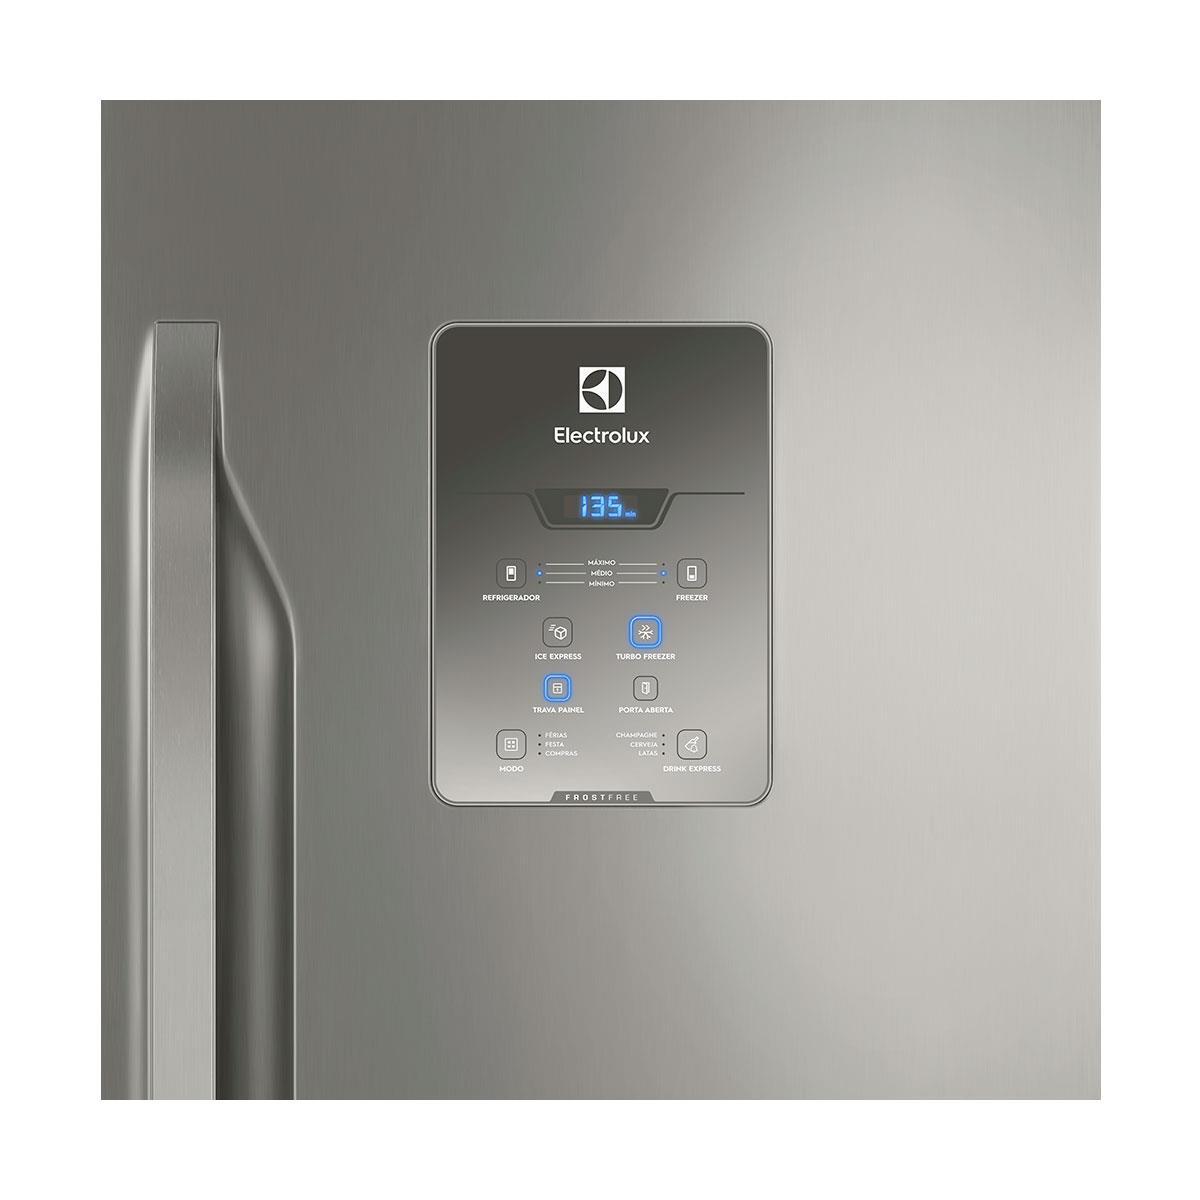 224b41b54 Refrigerador Electrolux DB84 Branco 598L Frost Free Bottom Freezer